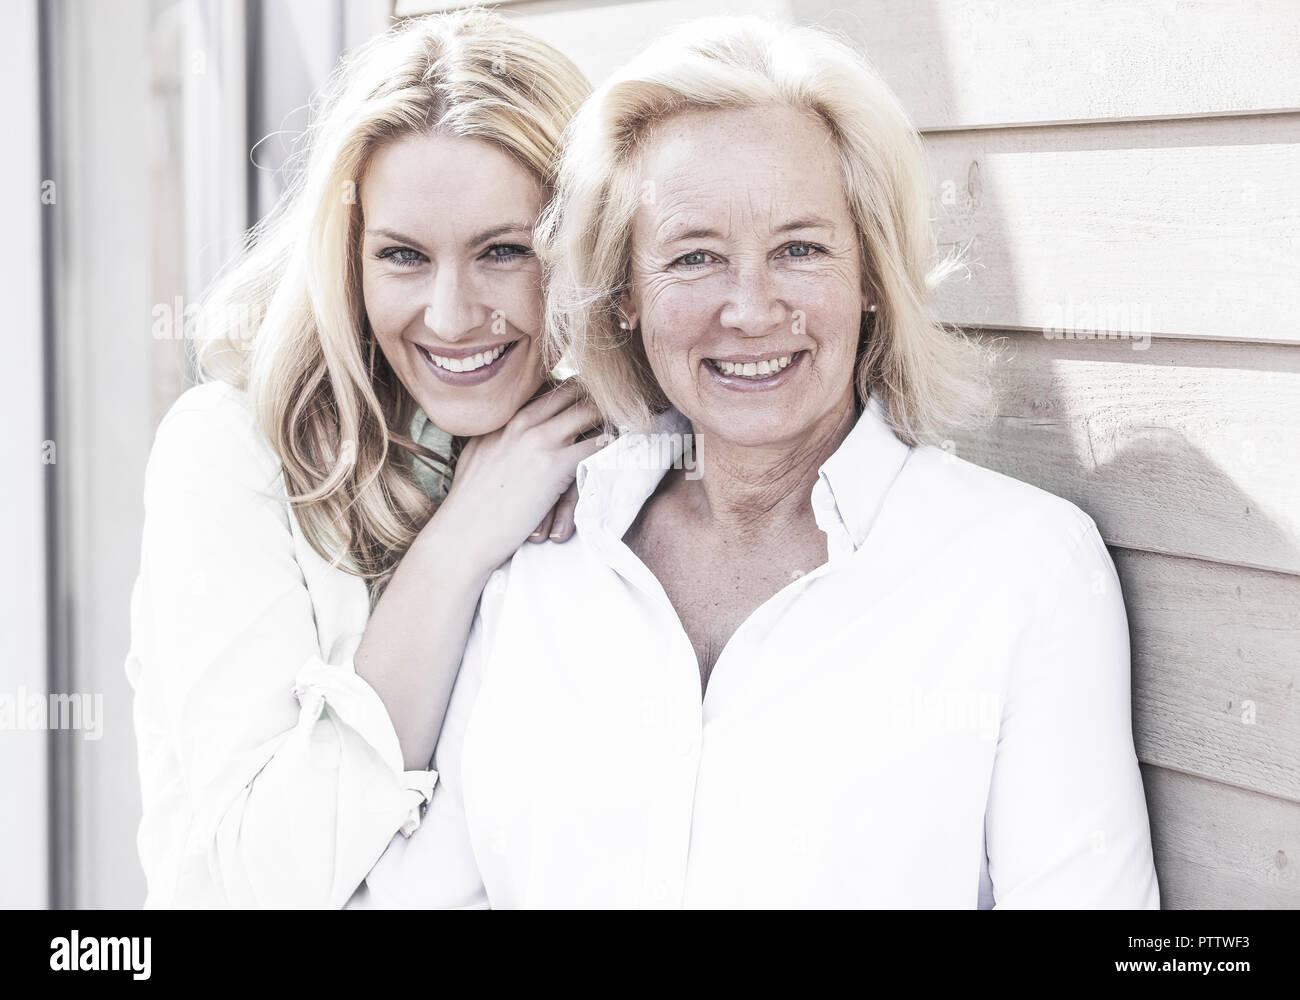 Mutter mit erwachsener Tochter, Portraet (model-released) - Stock Image